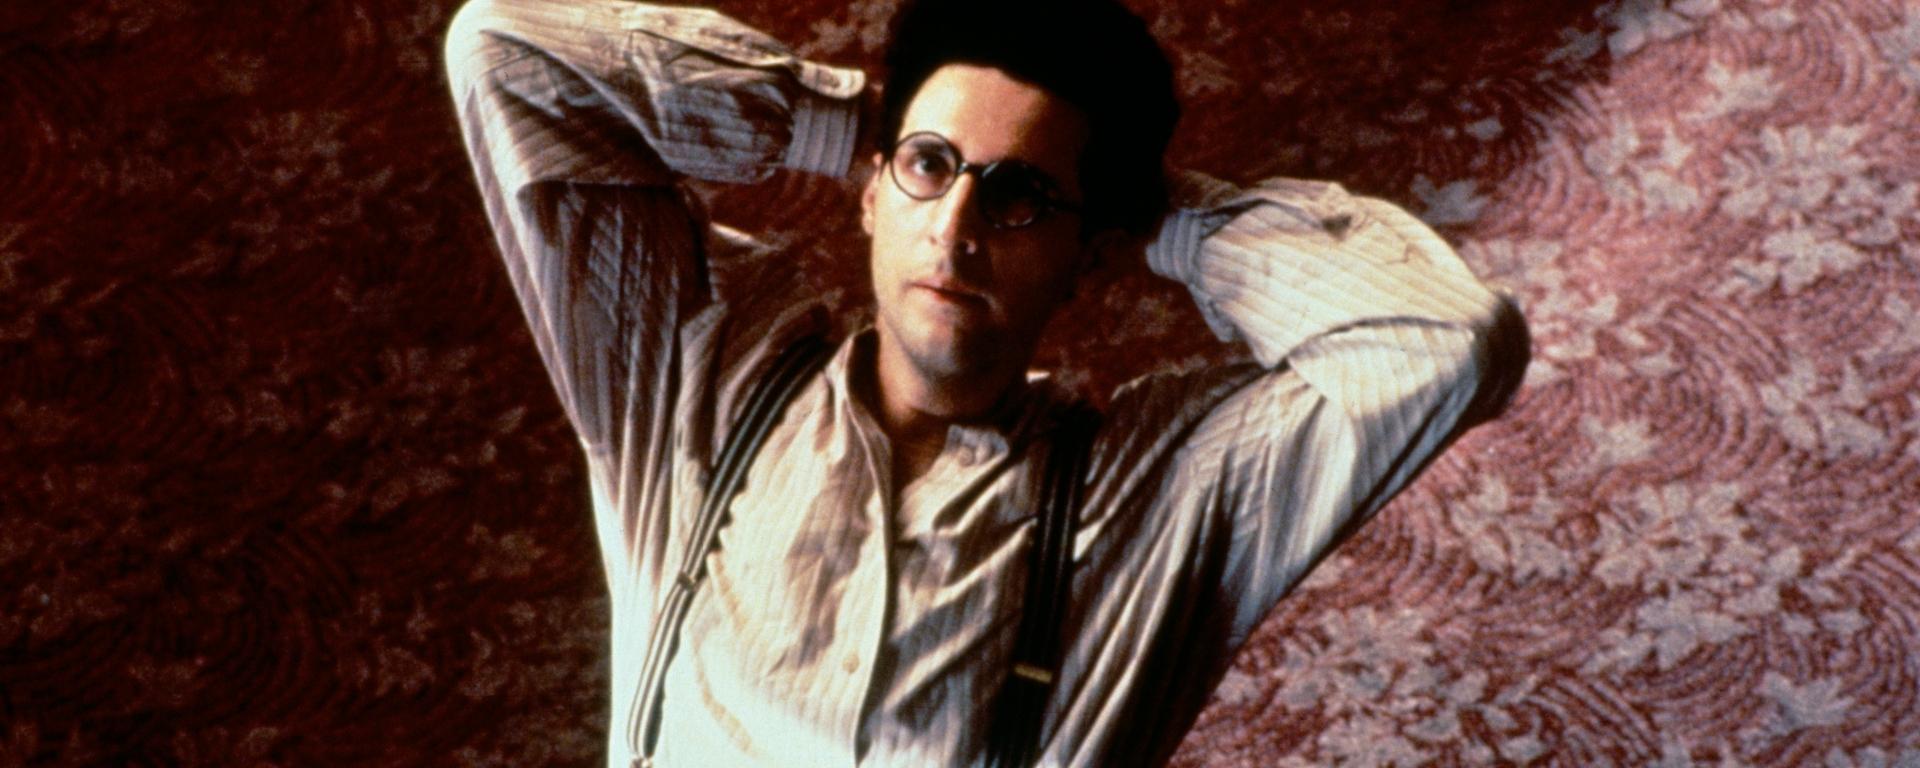 Barton Fink - CineFatti